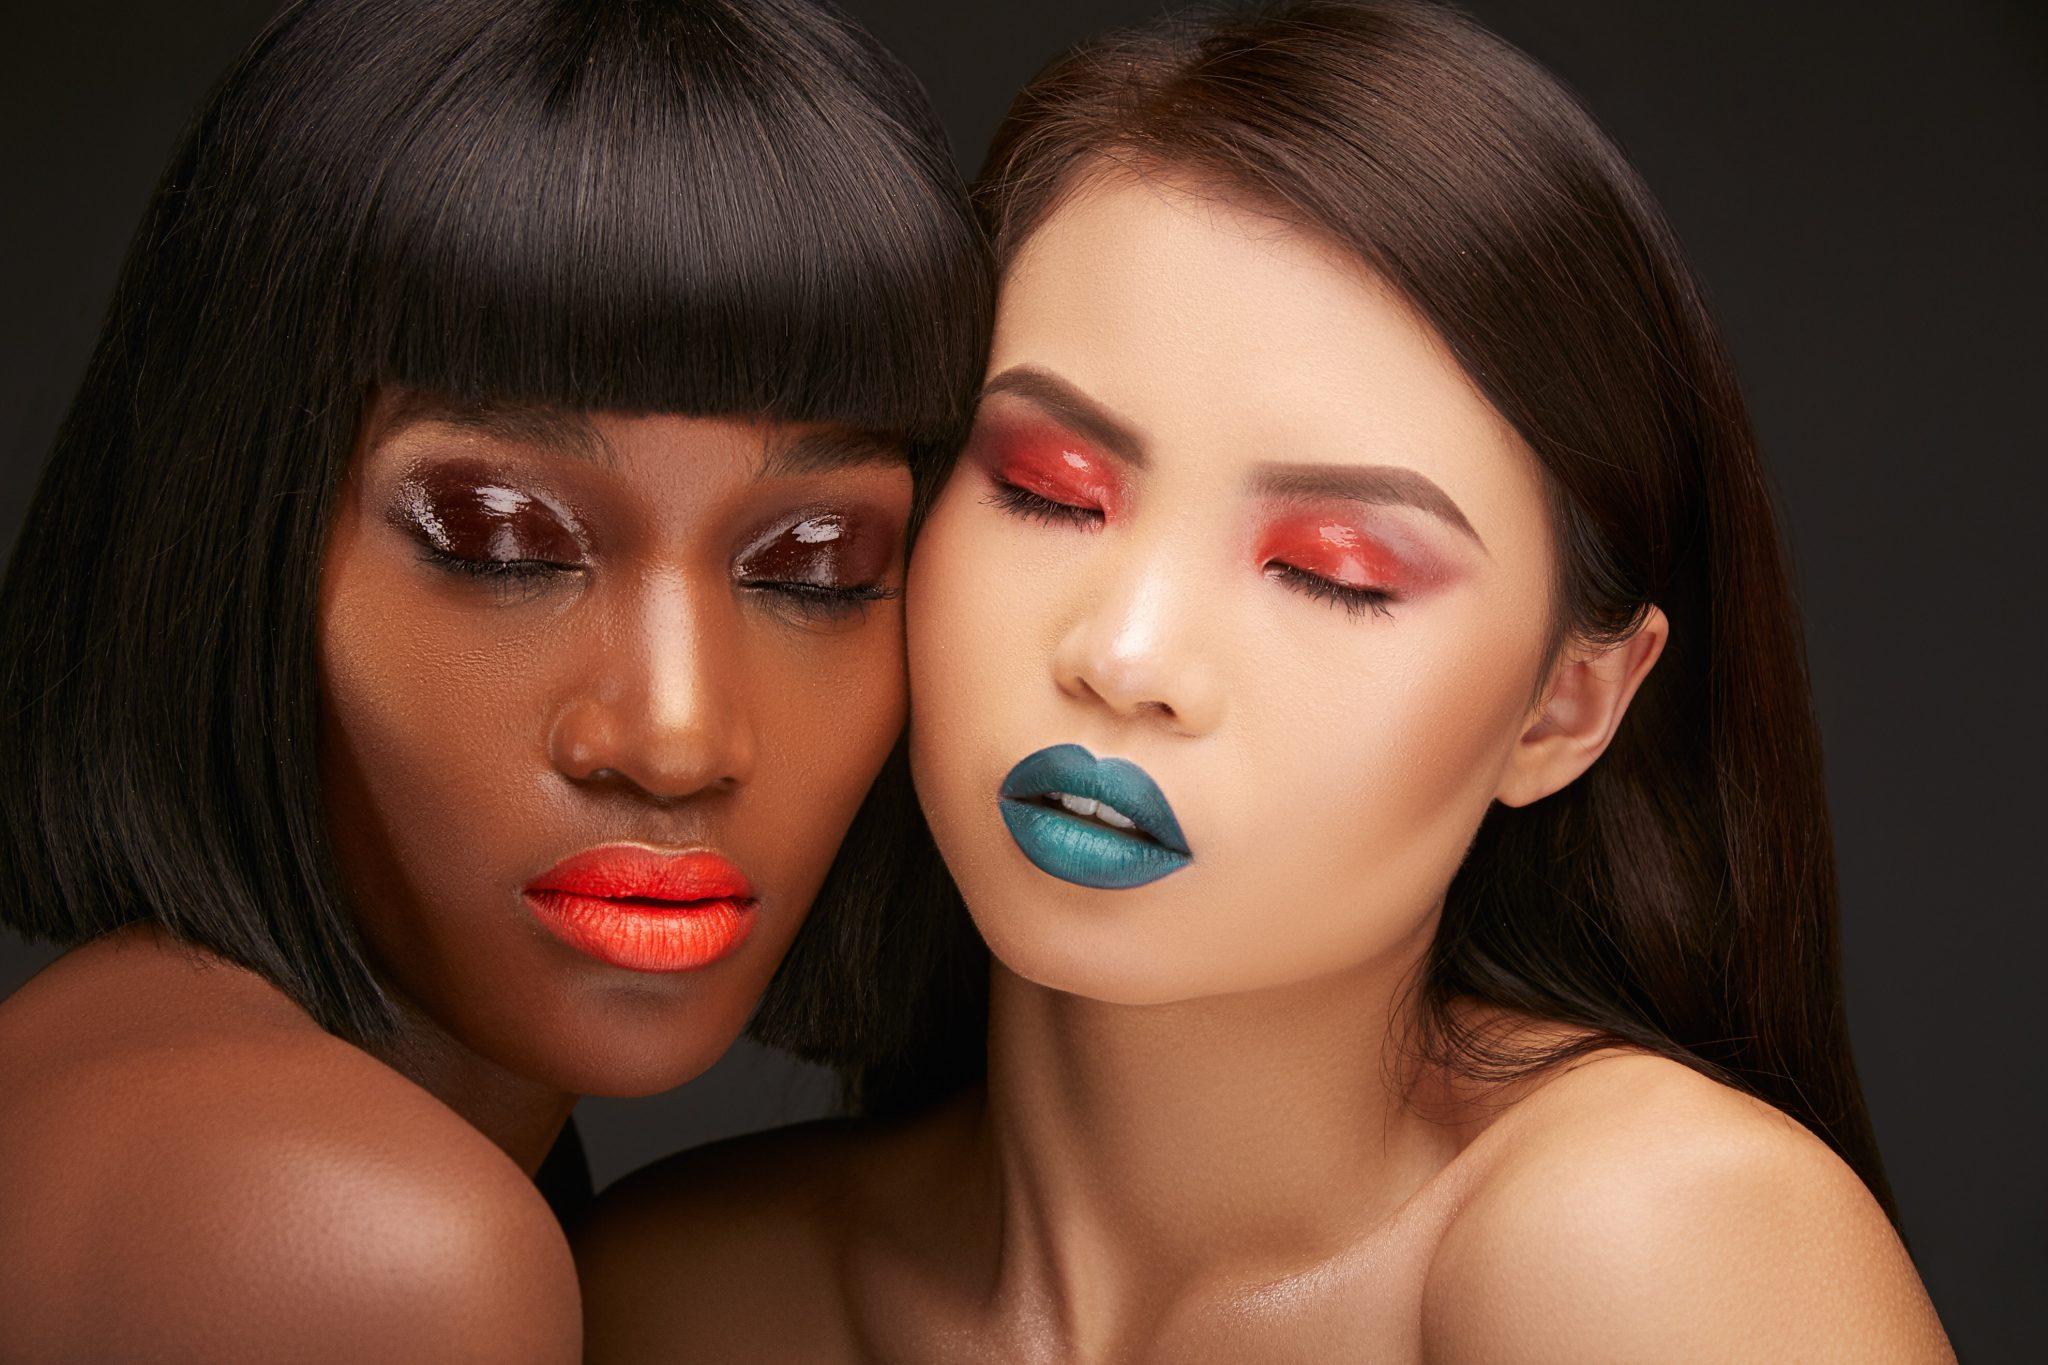 Translucent beauties